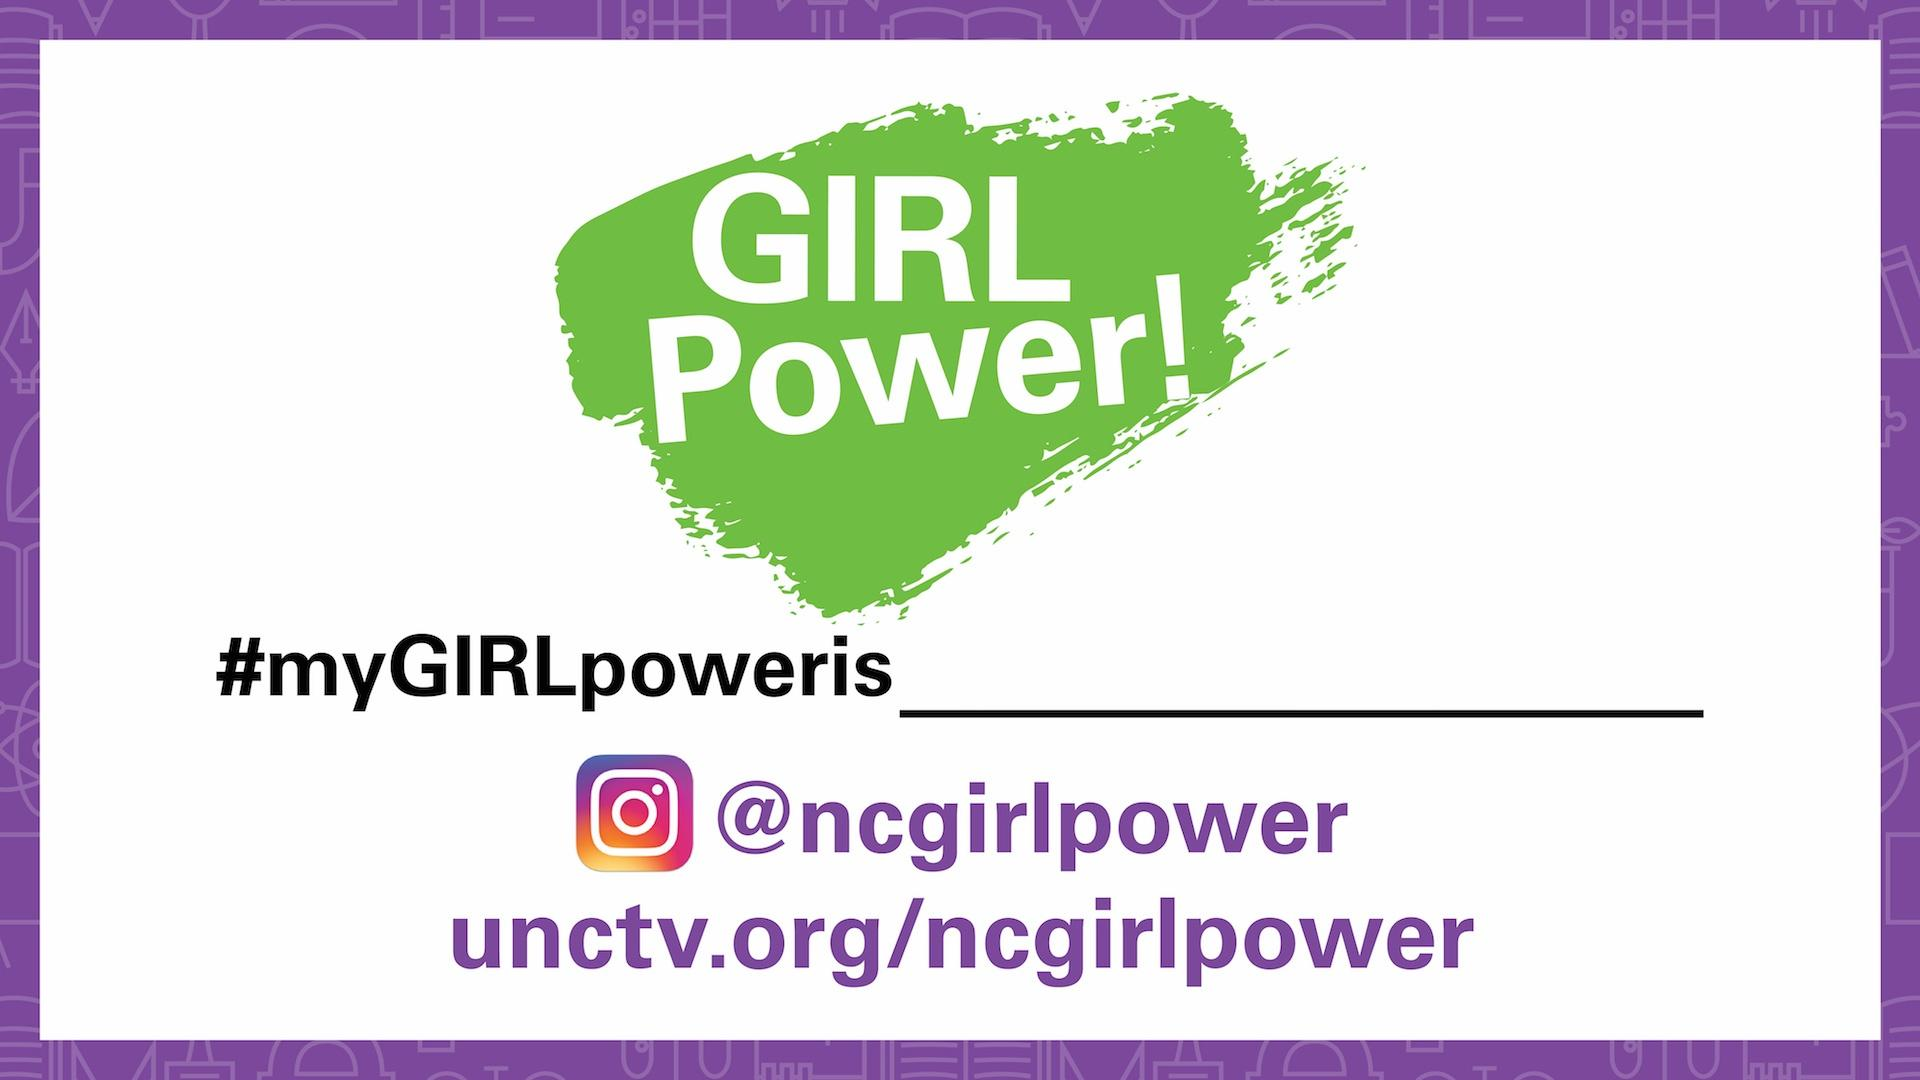 GIRL Power Print Off Image